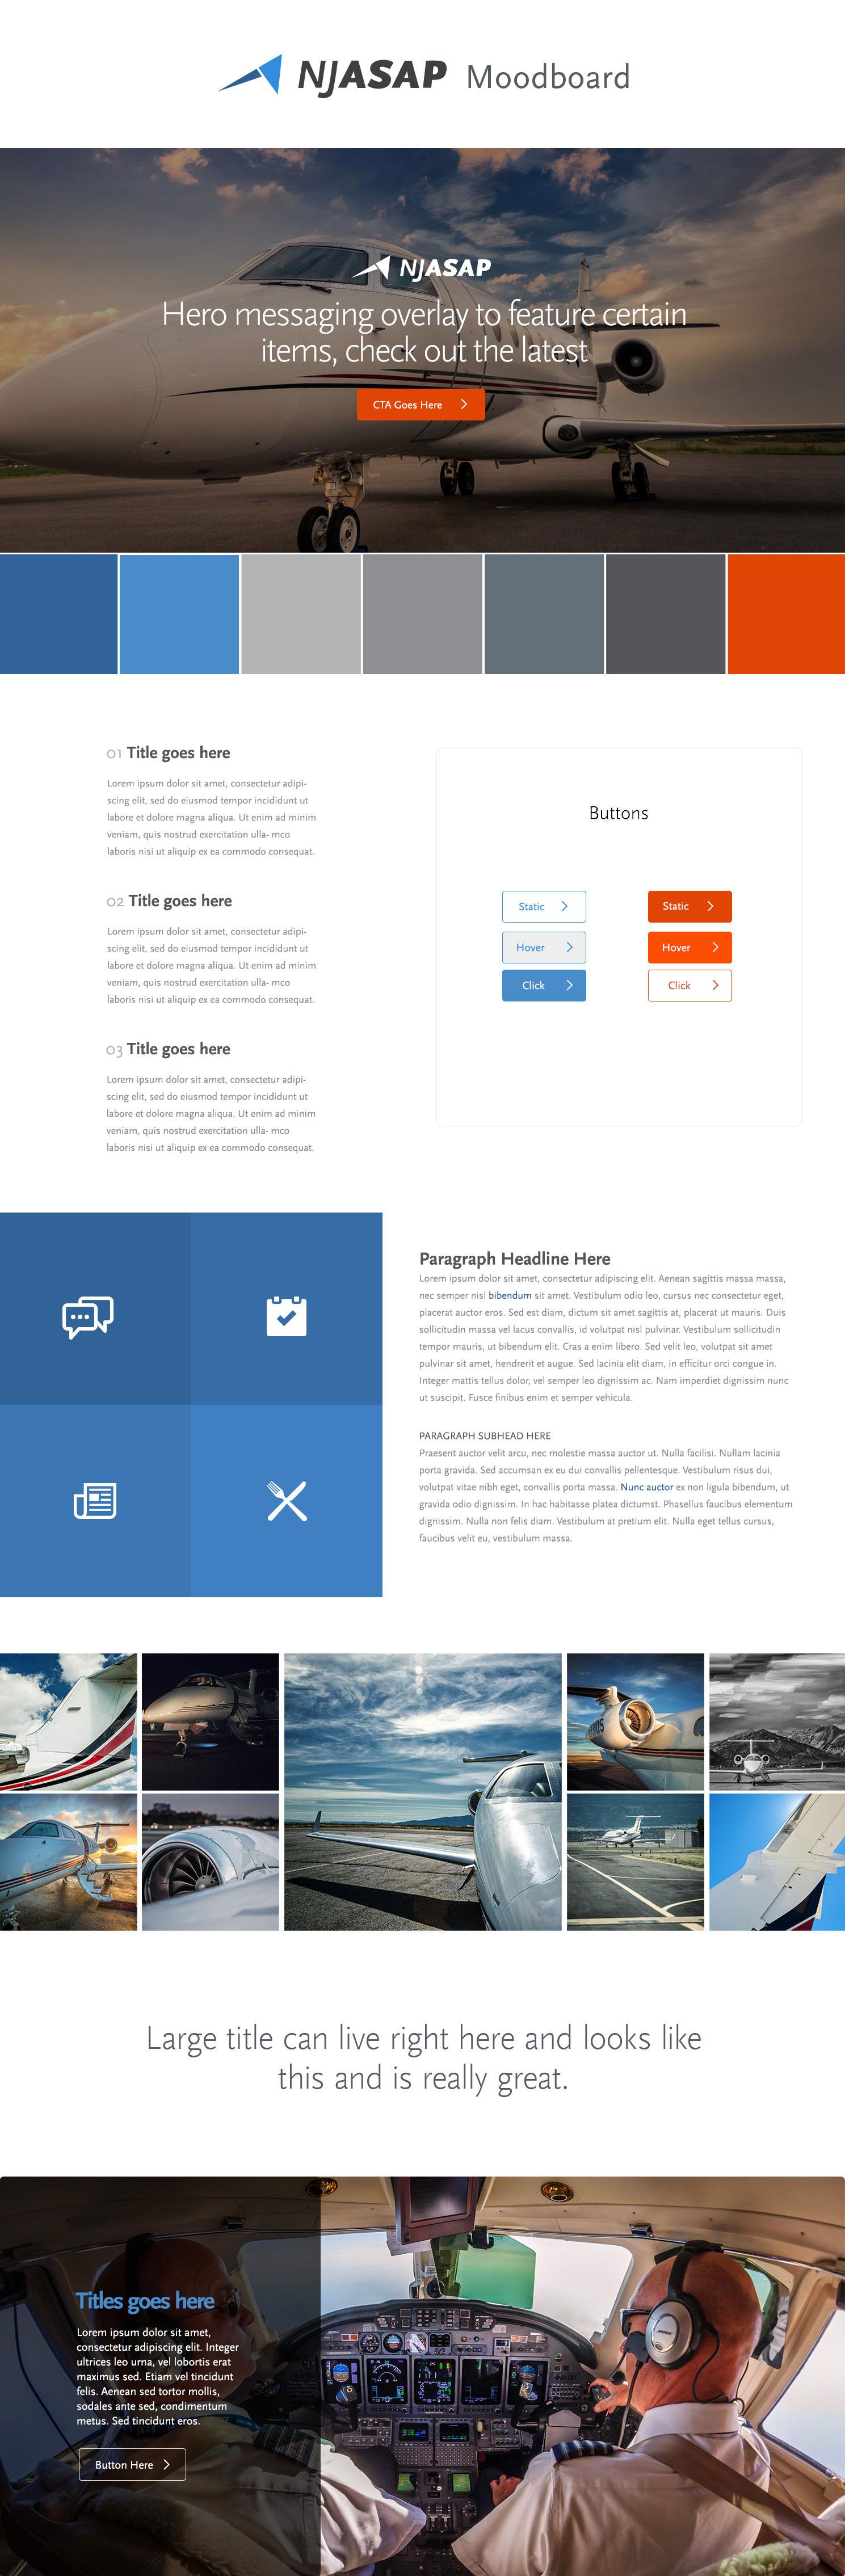 Web Design | NJASAP - Homepage (Desktop View)